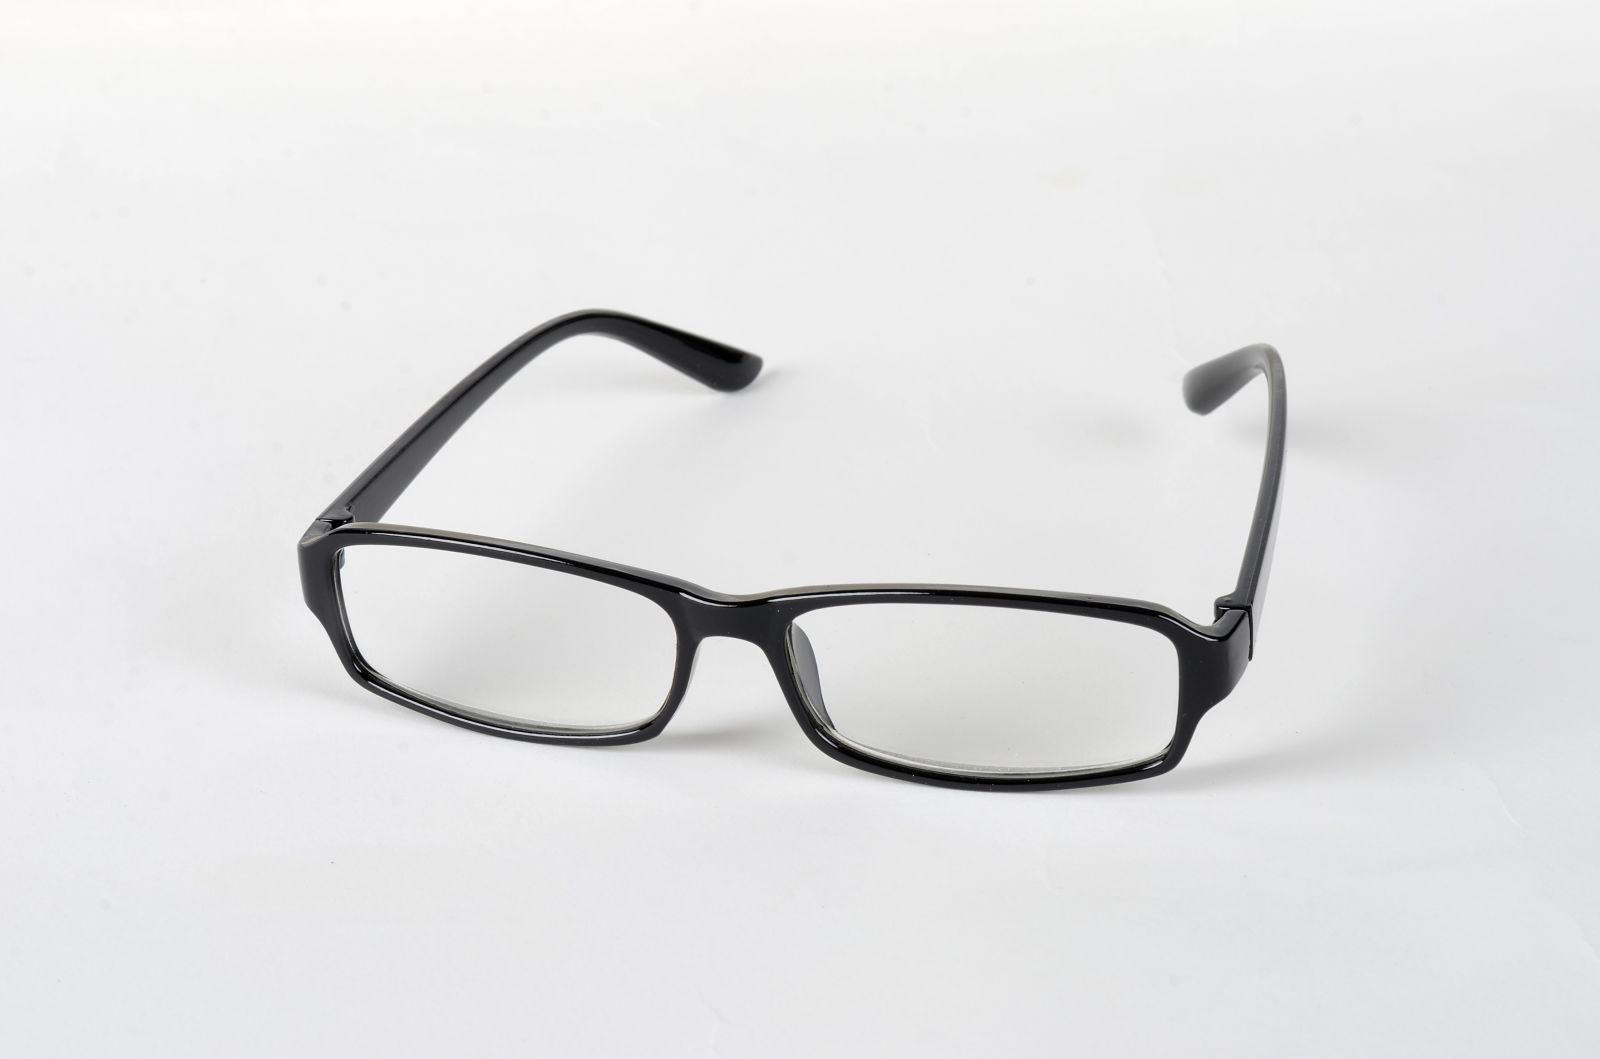 Dioptrické brýle 2082 +4,0